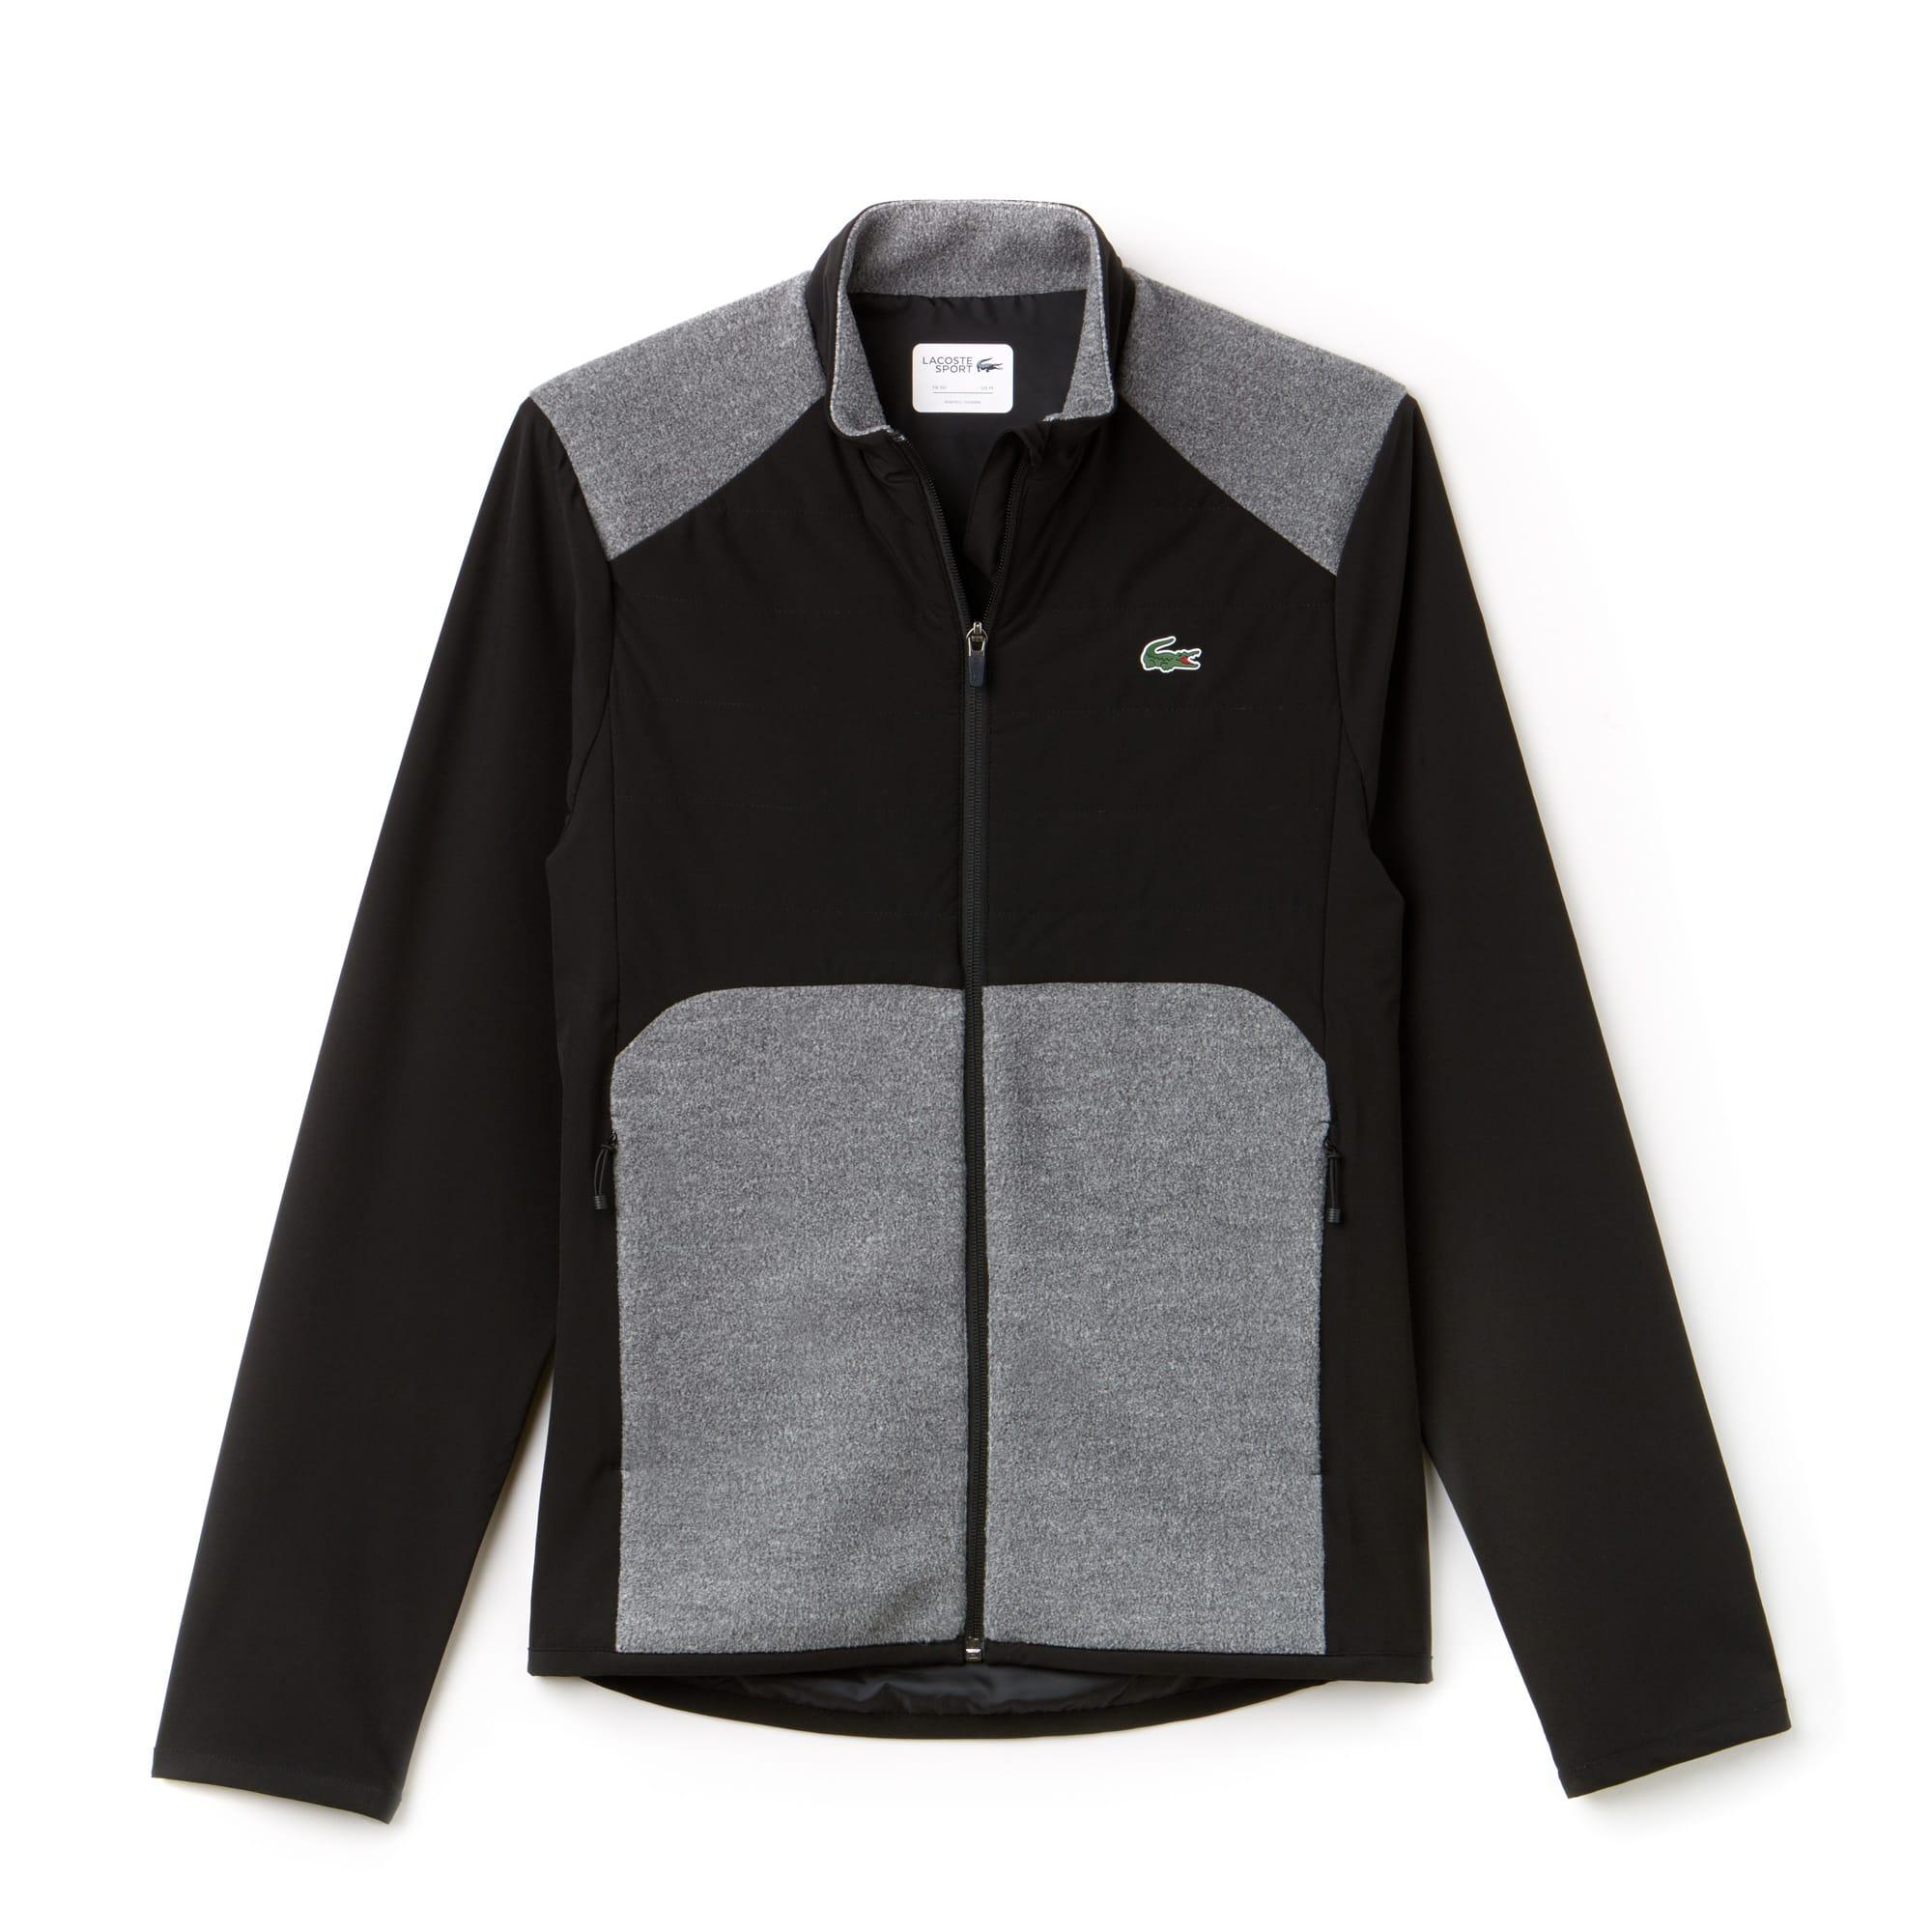 Men's SPORT Water-Resistant Bi-Material Golf Jacket